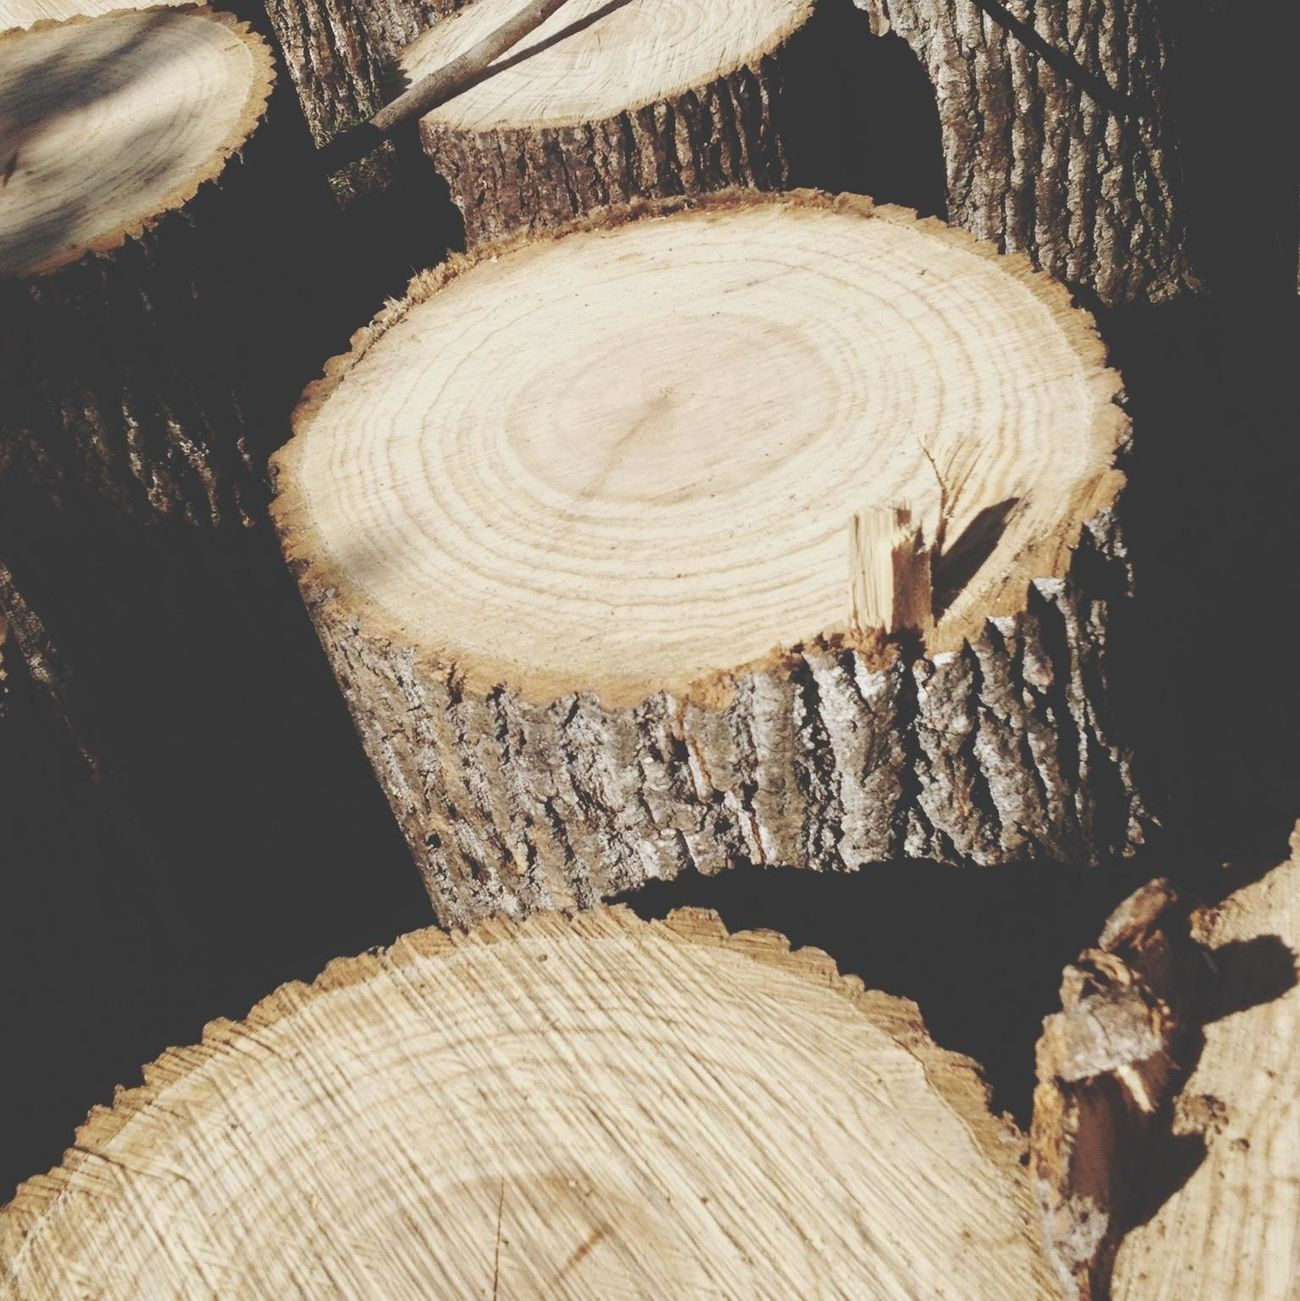 Wood Tree Trunk Firewood Fall Time